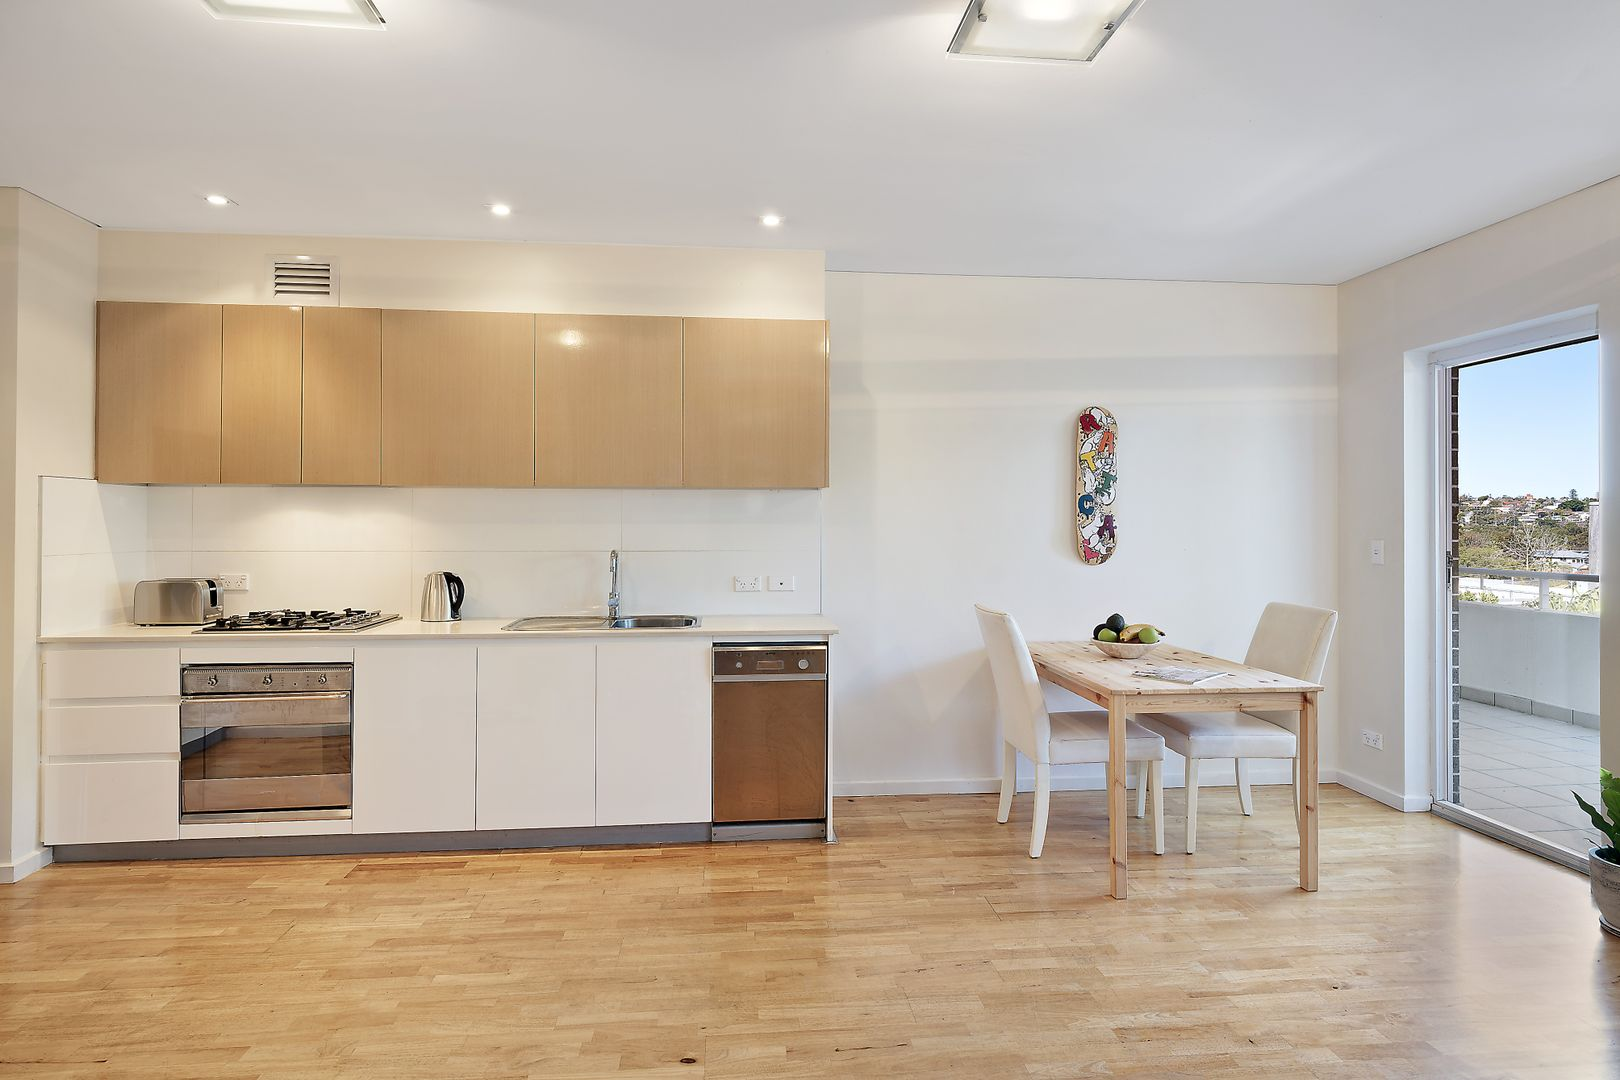 17/19-23 Waine Street, Freshwater NSW 2096, Image 1